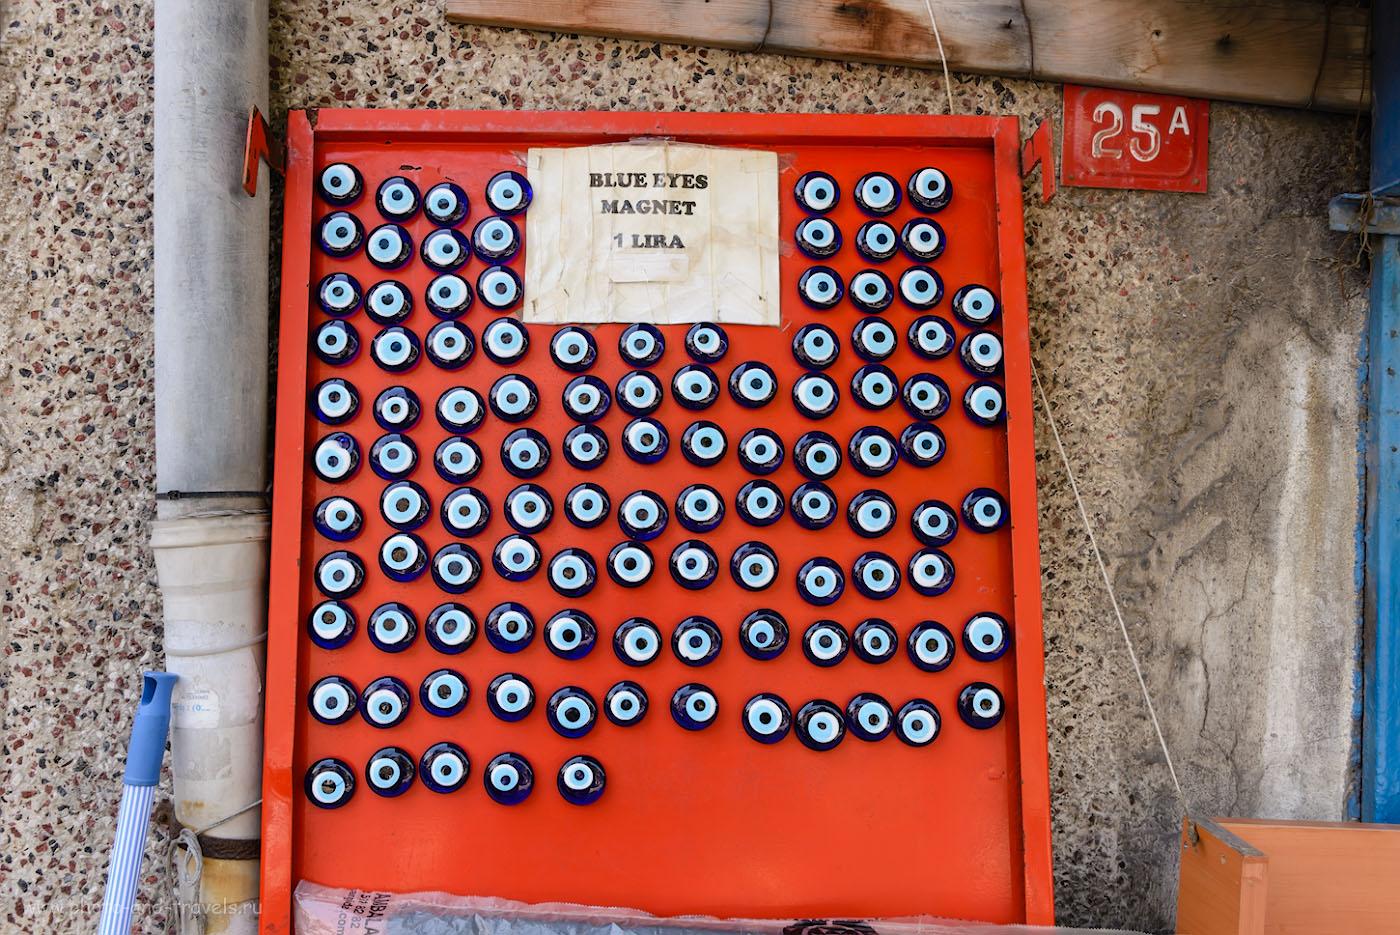 Фото 18. Амулет от сглаза «Назар Бонджук» (Nazar boncuk), глаз Фатимы. 1/80, 8.0, 200, 32.